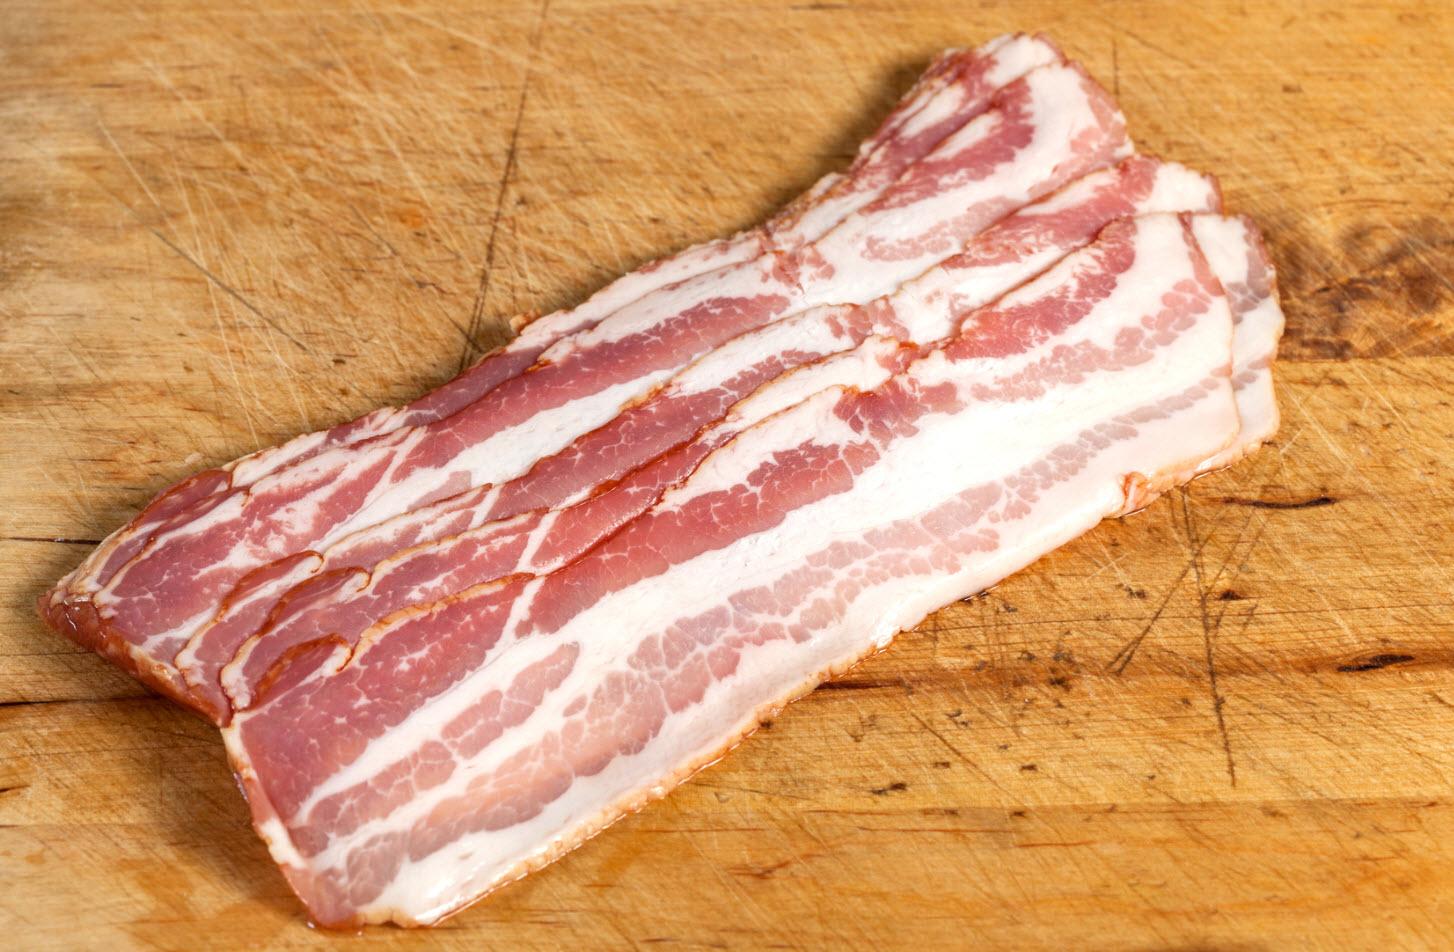 Bacon image 2